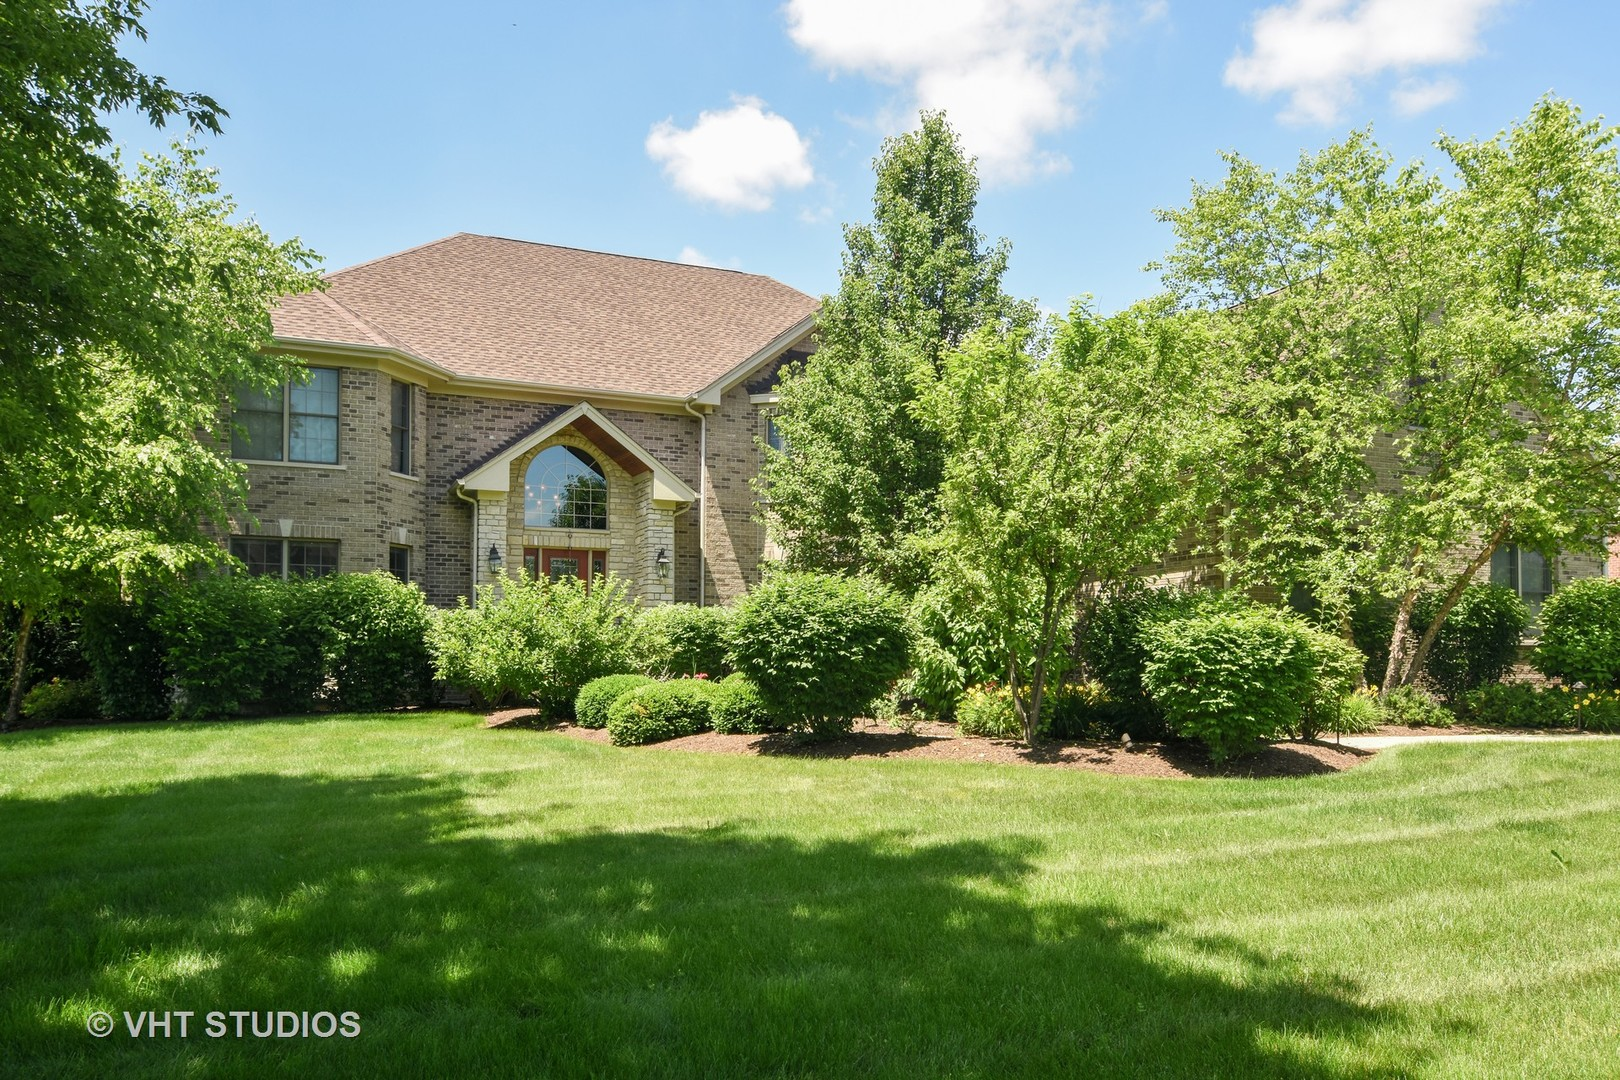 4 Oliver Way, Hawthorn Woods, Illinois 60047